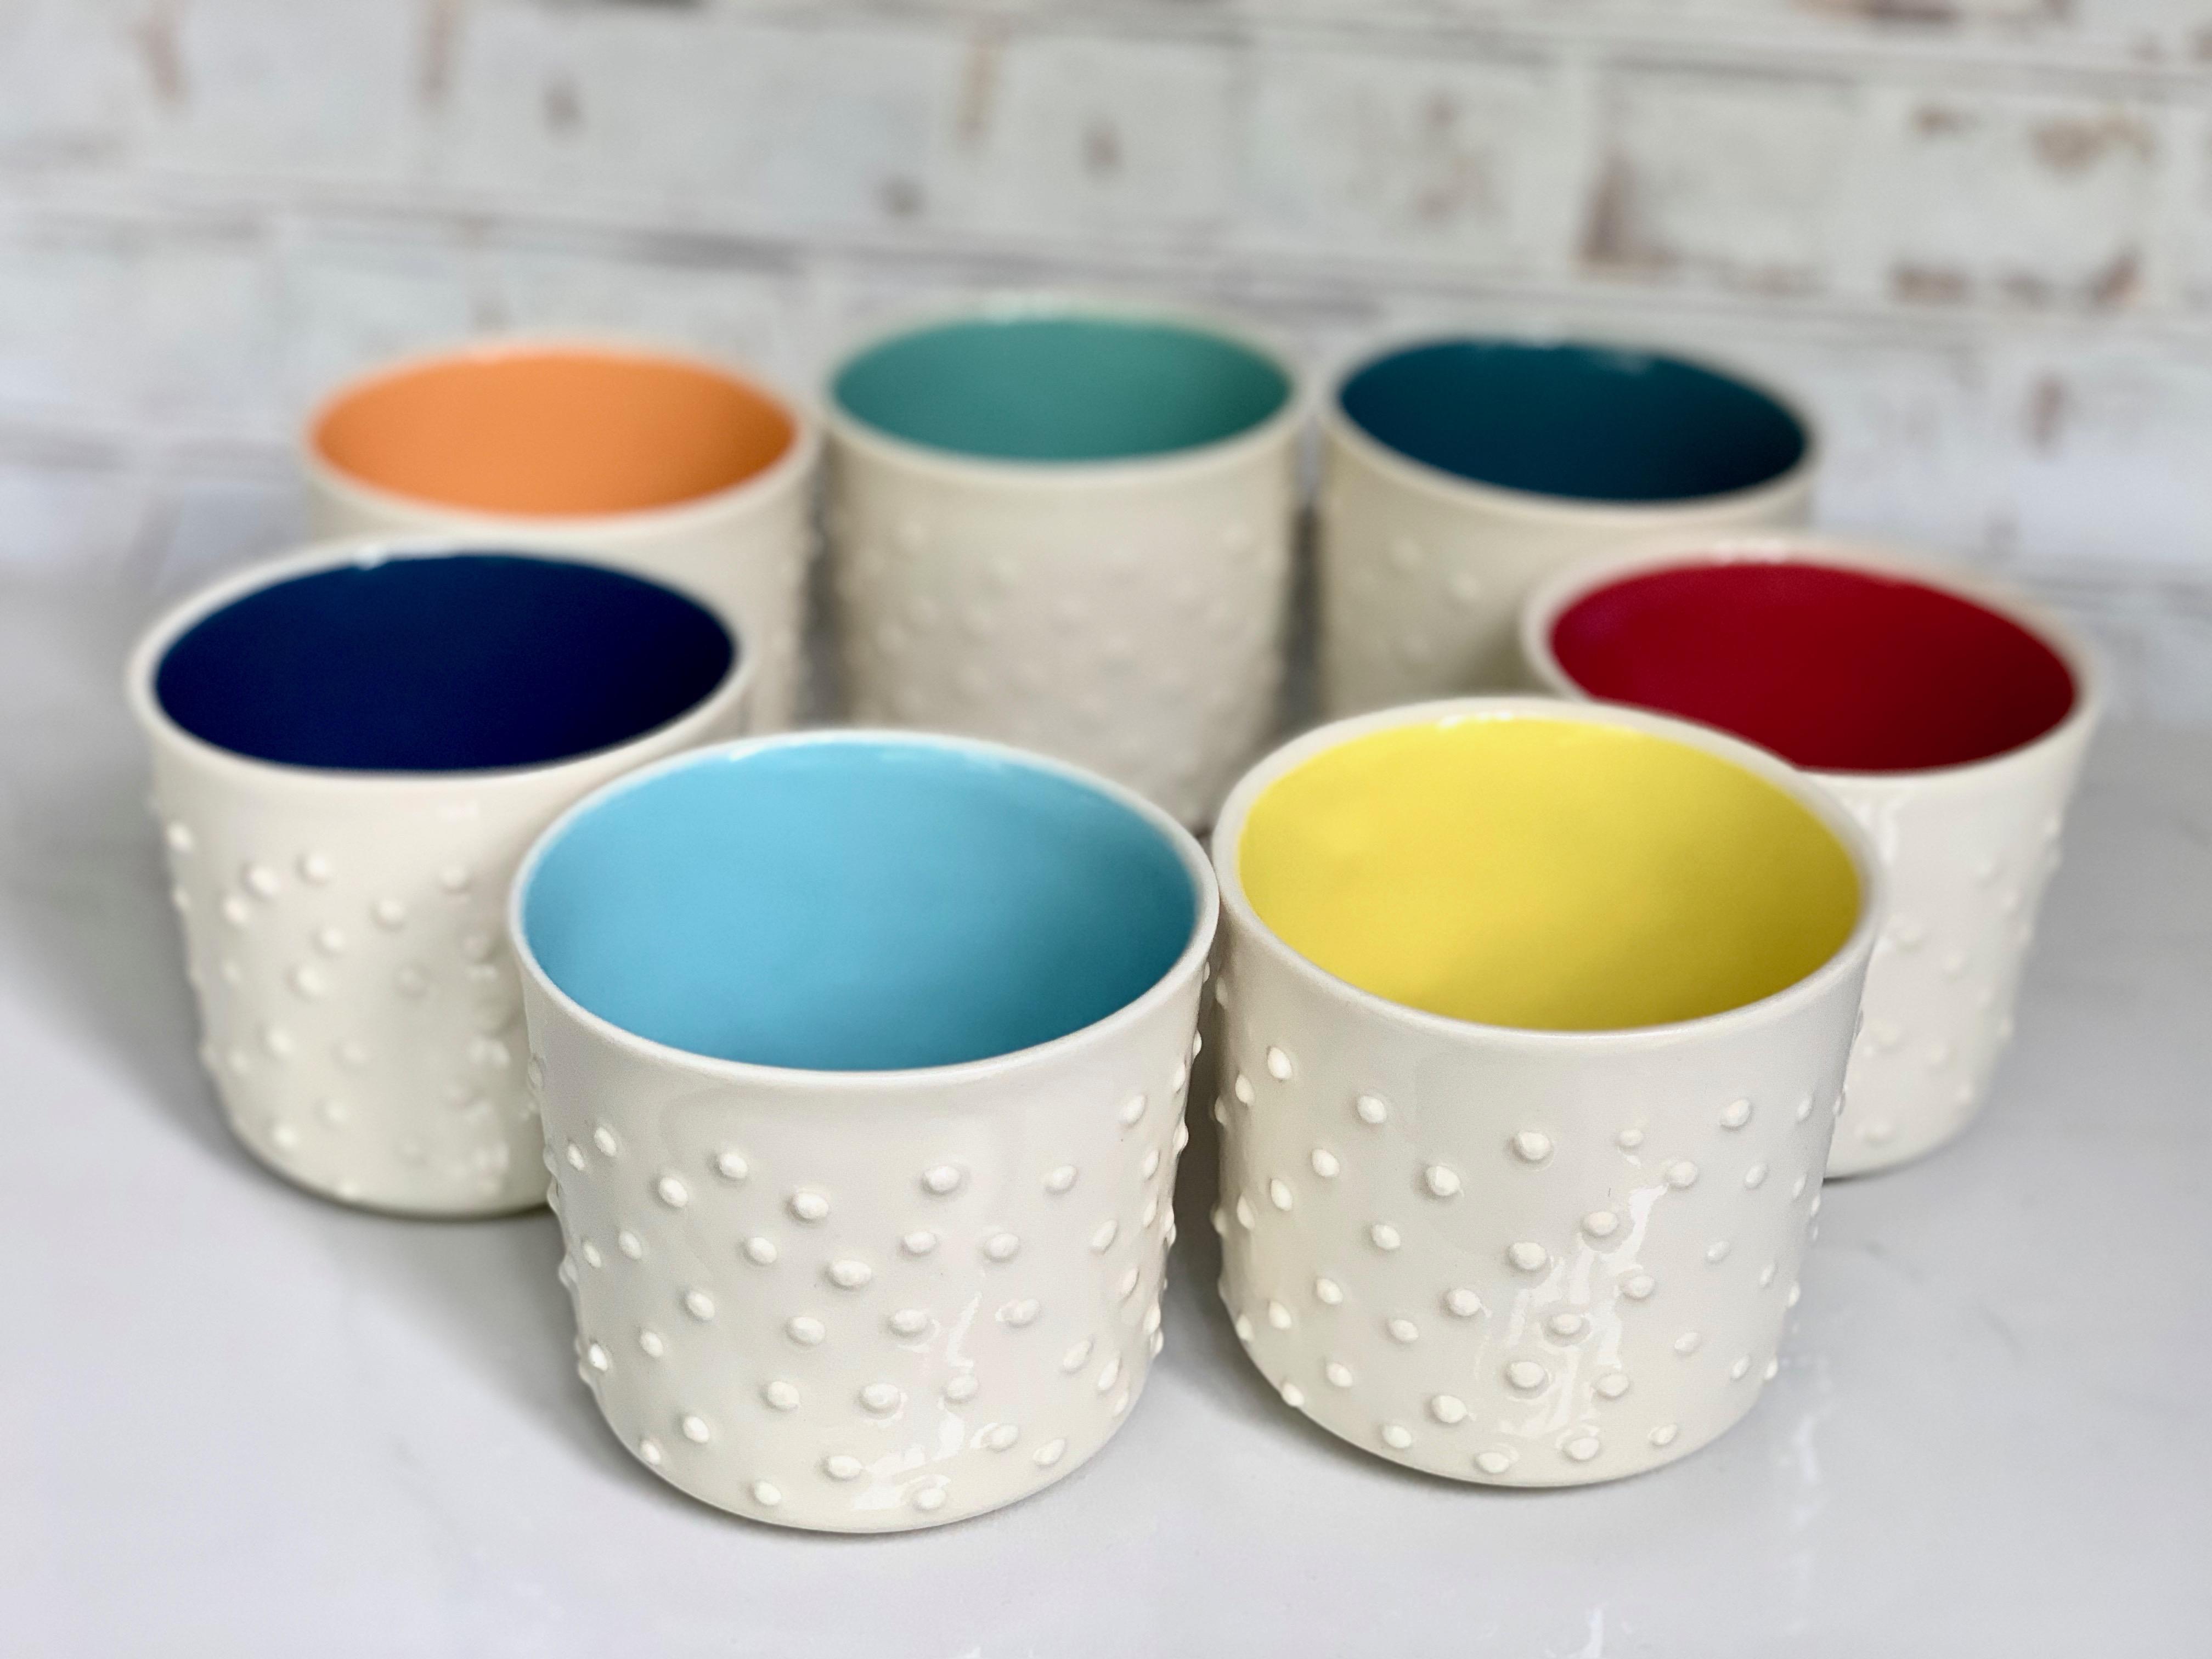 studdedespressocups